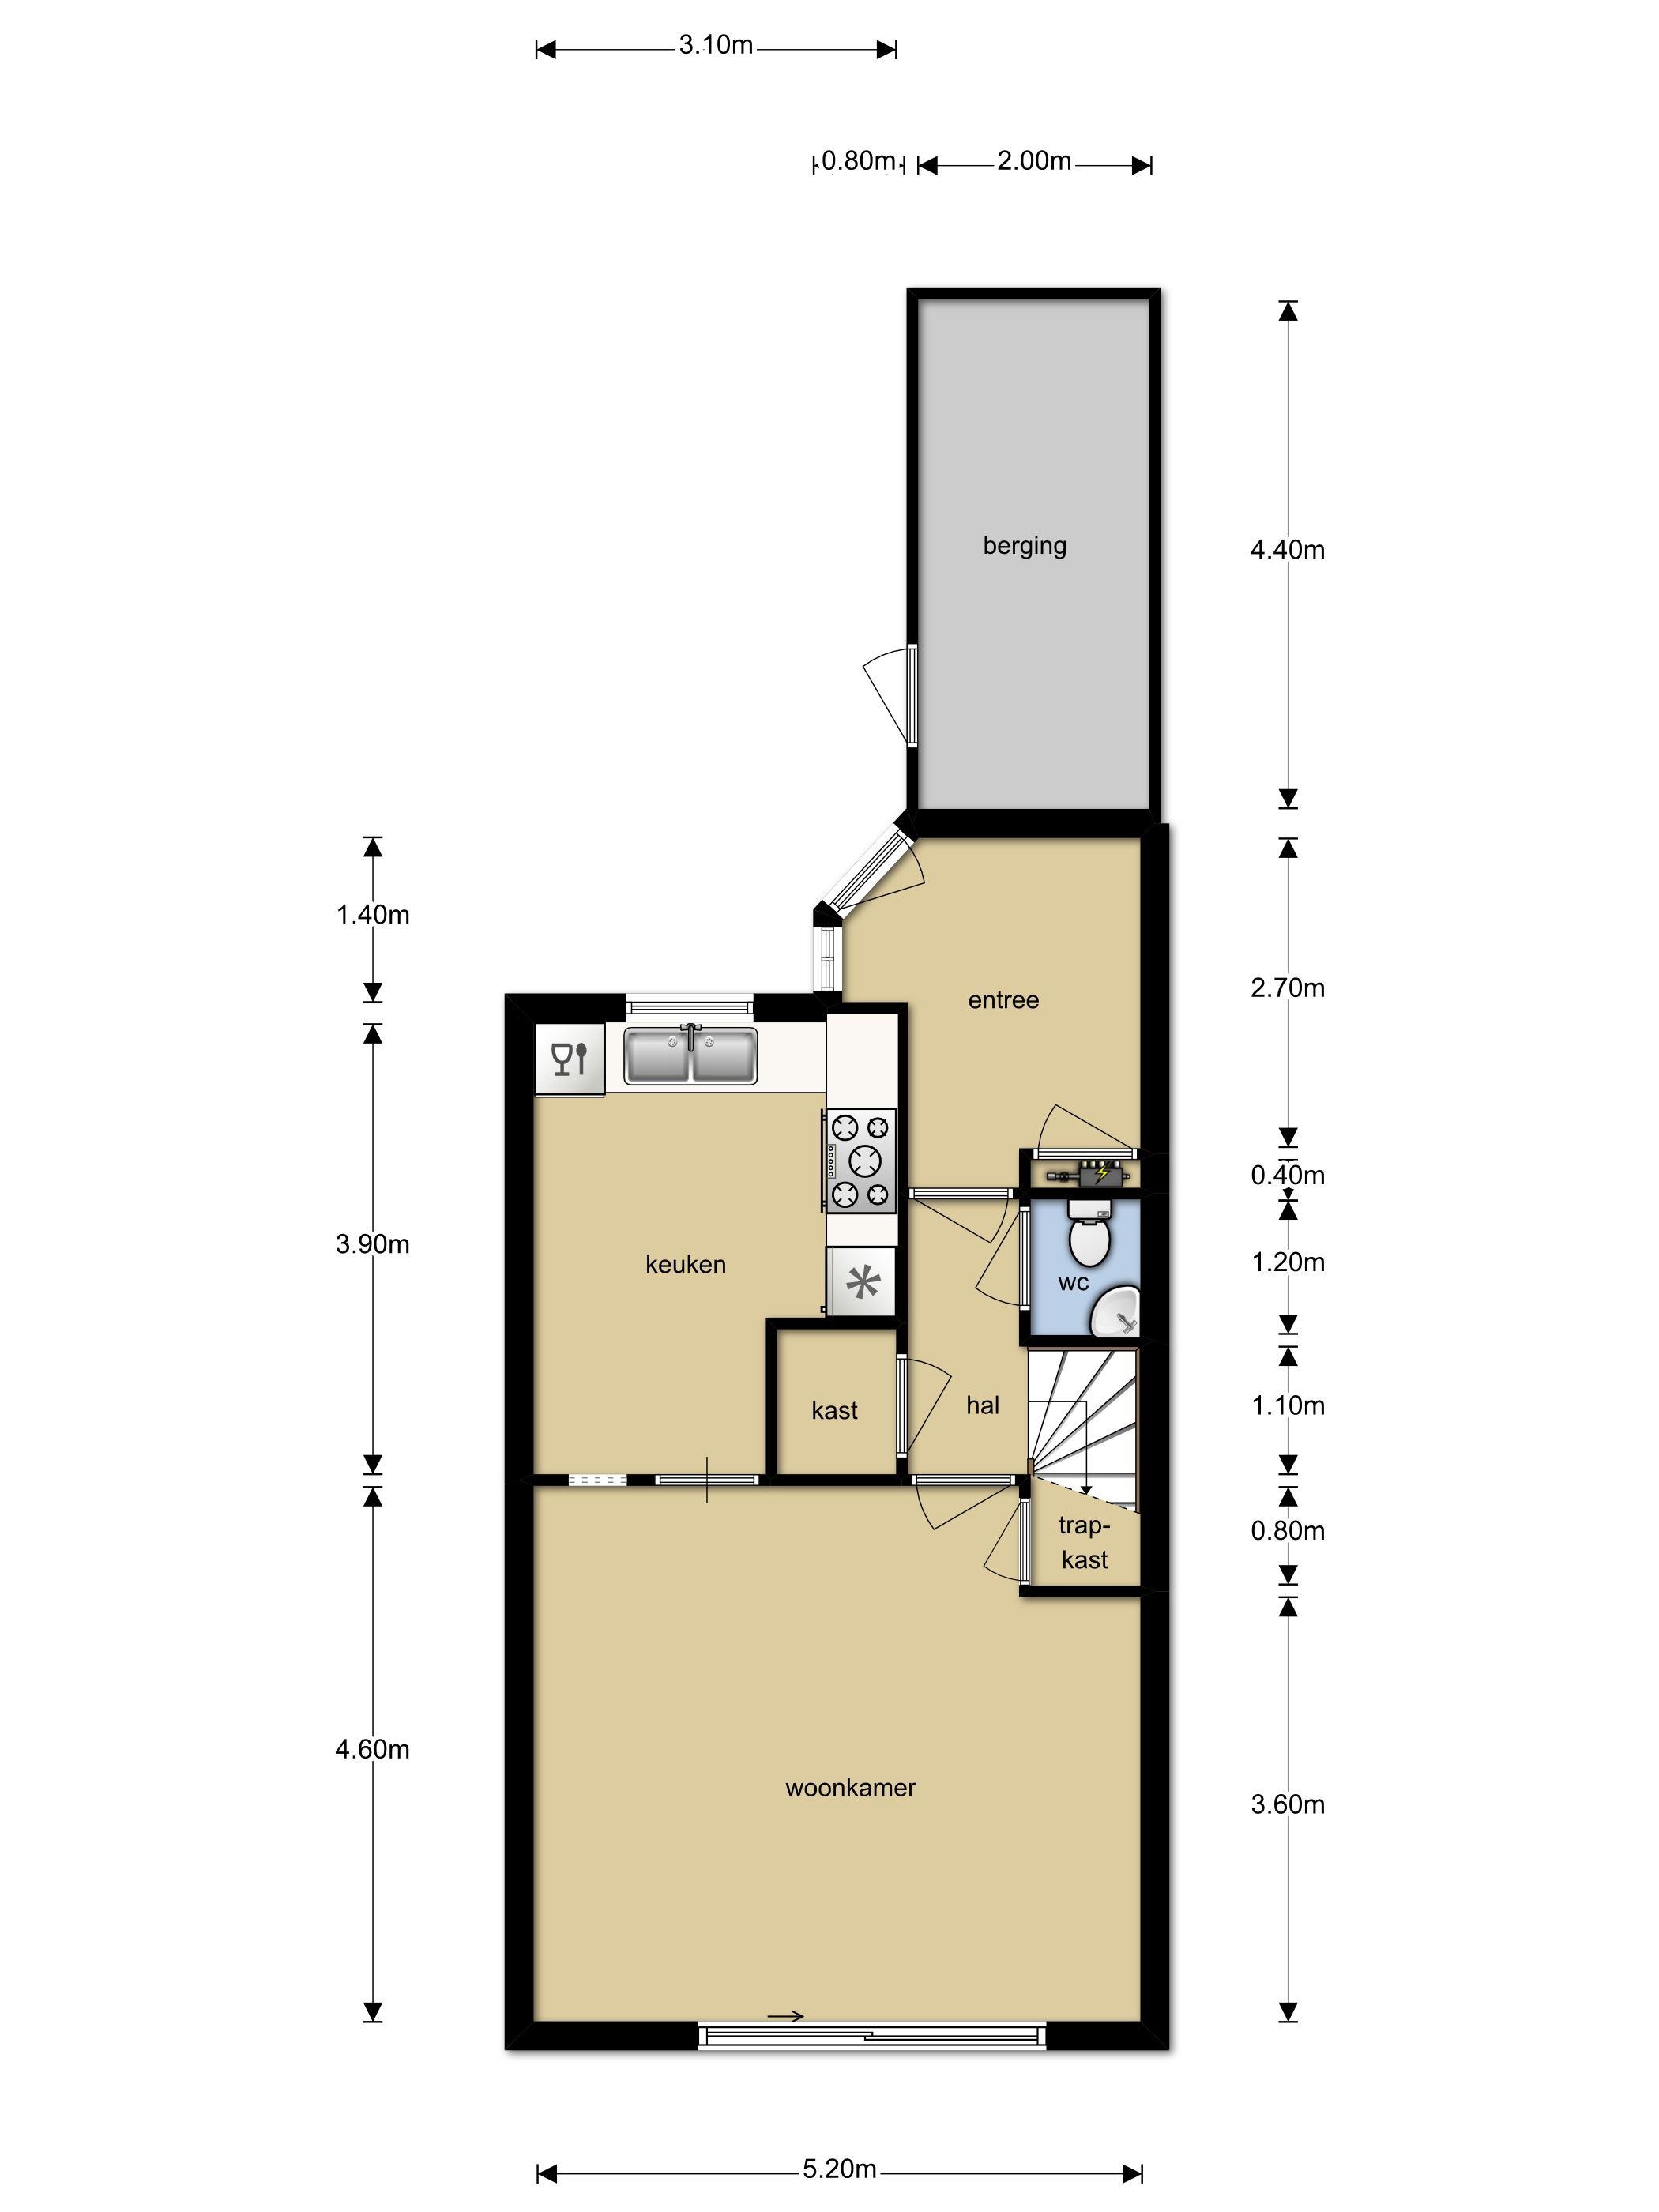 Huis te koop tamboer 165 6866 eh heelsum funda - Foto moderne inbouwkeuken ...